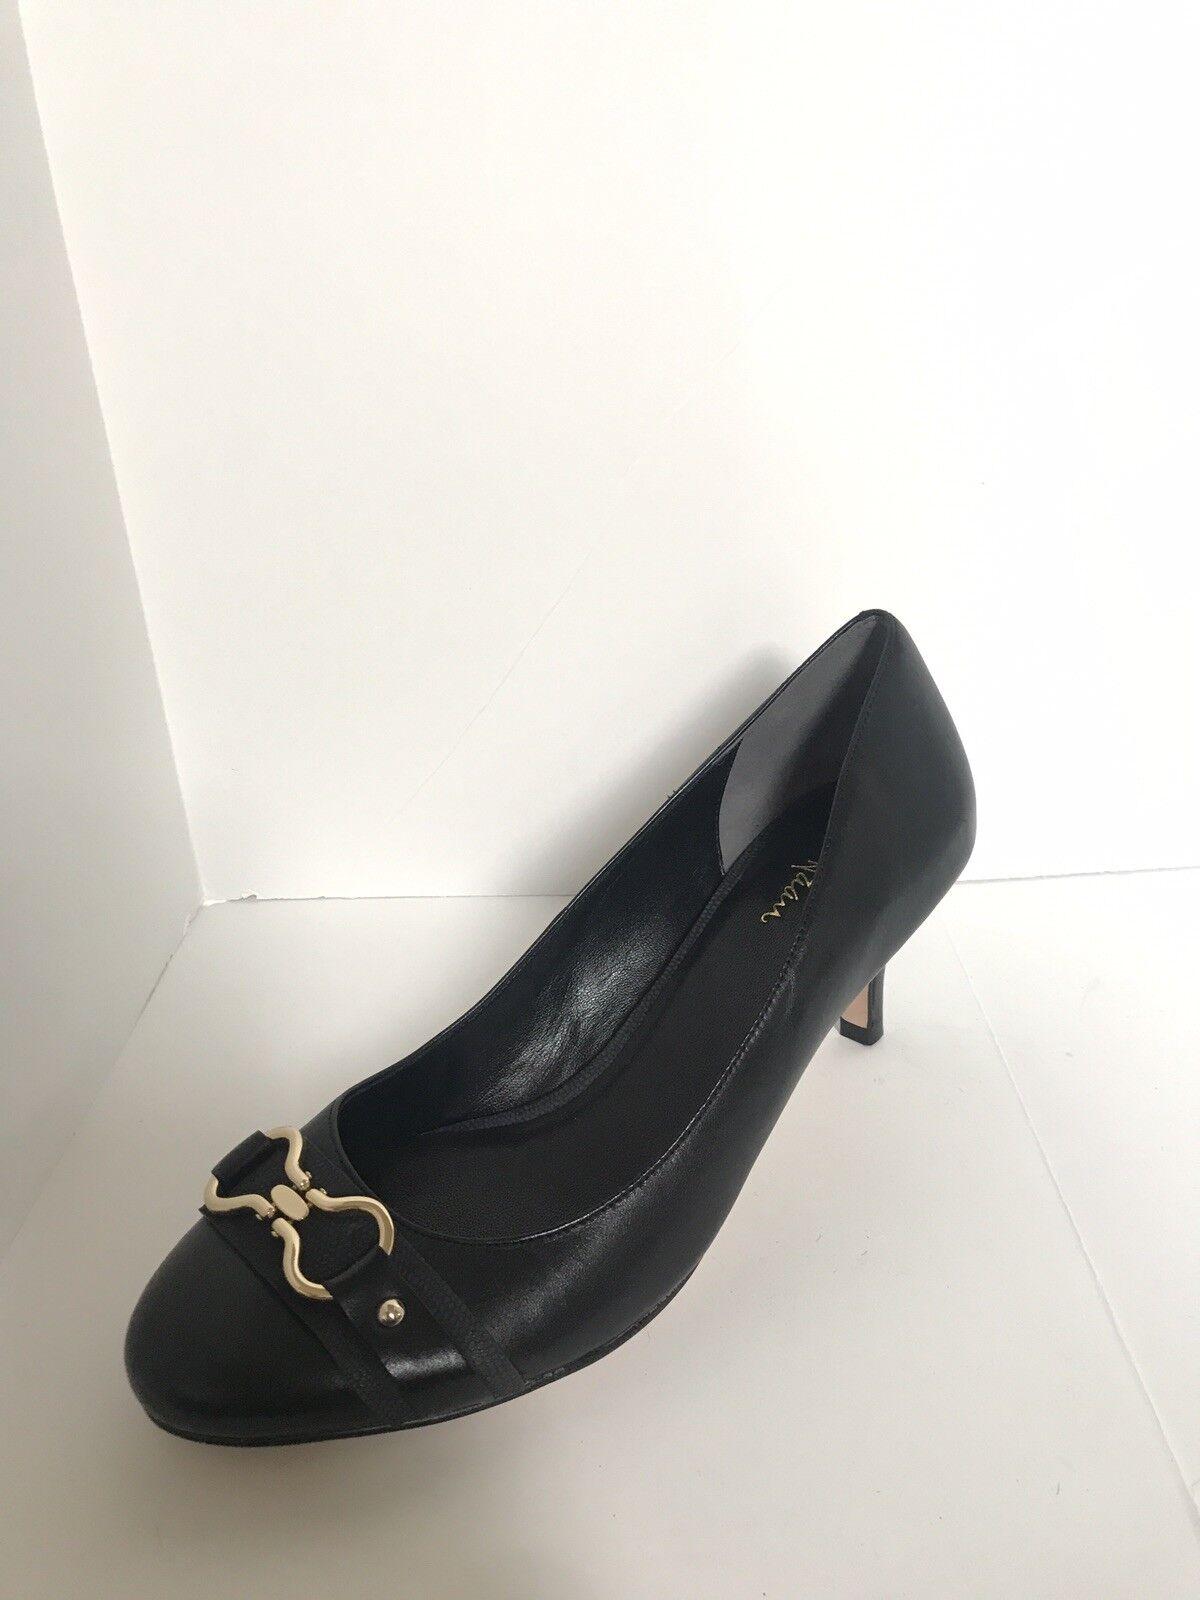 Women's Women's Women's Cole Haan NikeAir Low Black Heels Size 10 AA 052960